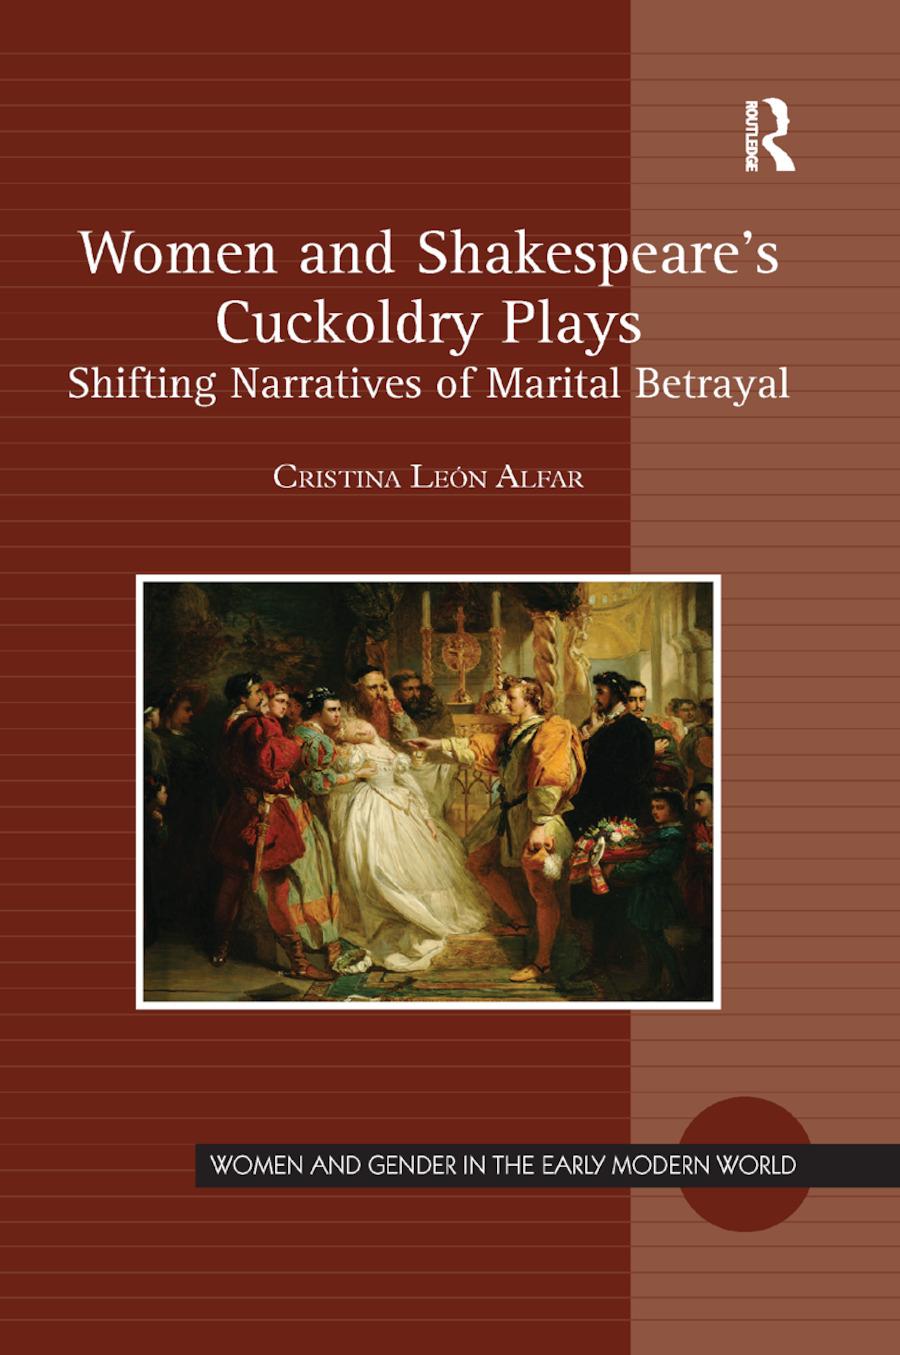 Women and Shakespeare's Cuckoldry Plays: Shifting Narratives of Marital Betrayal book cover